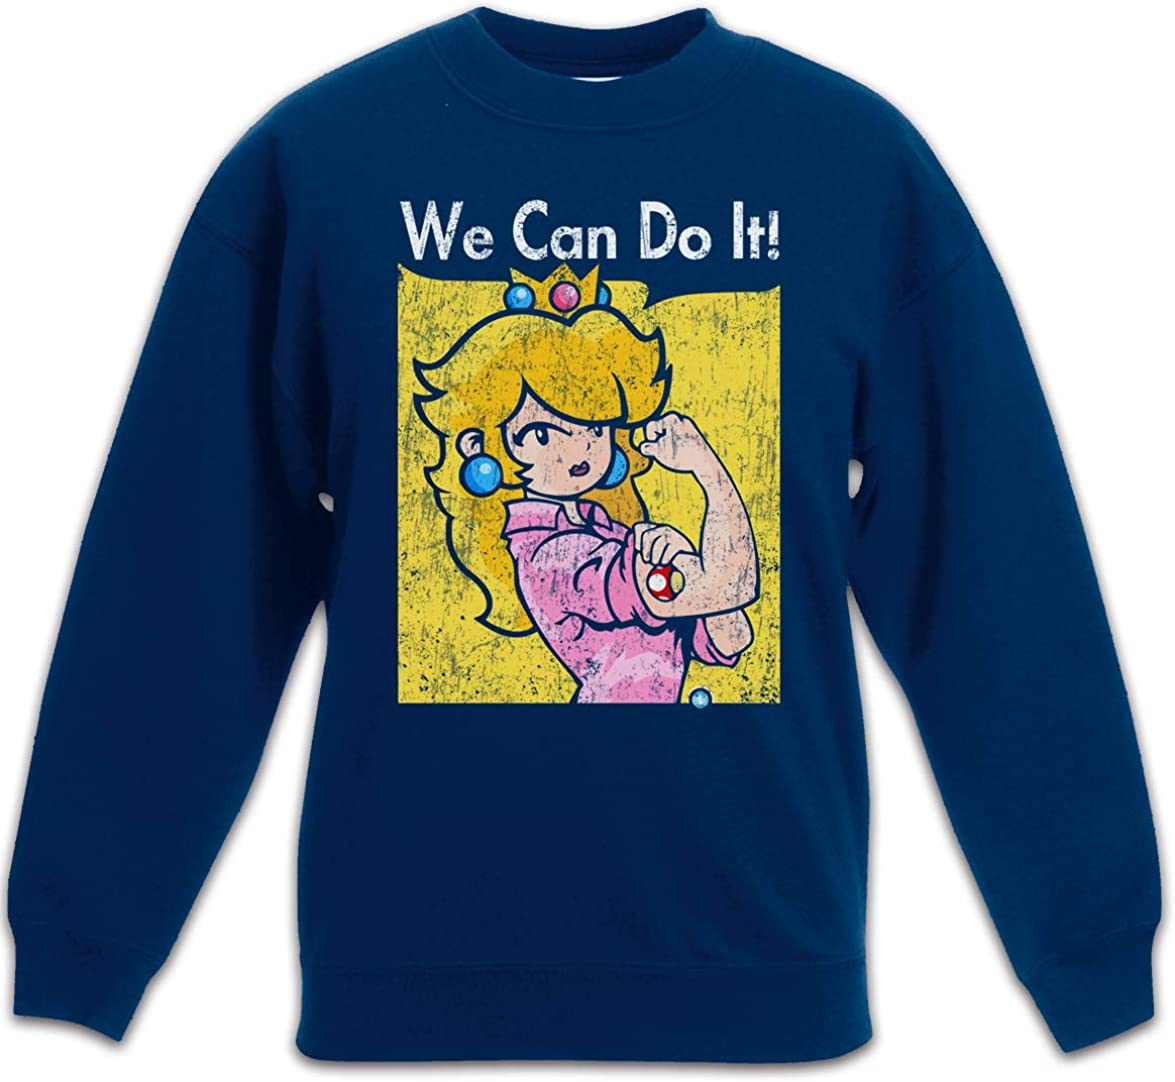 Urban Backwoods We Can Do It Princess Kids Children Boys Girls Sweatshirt Pullover